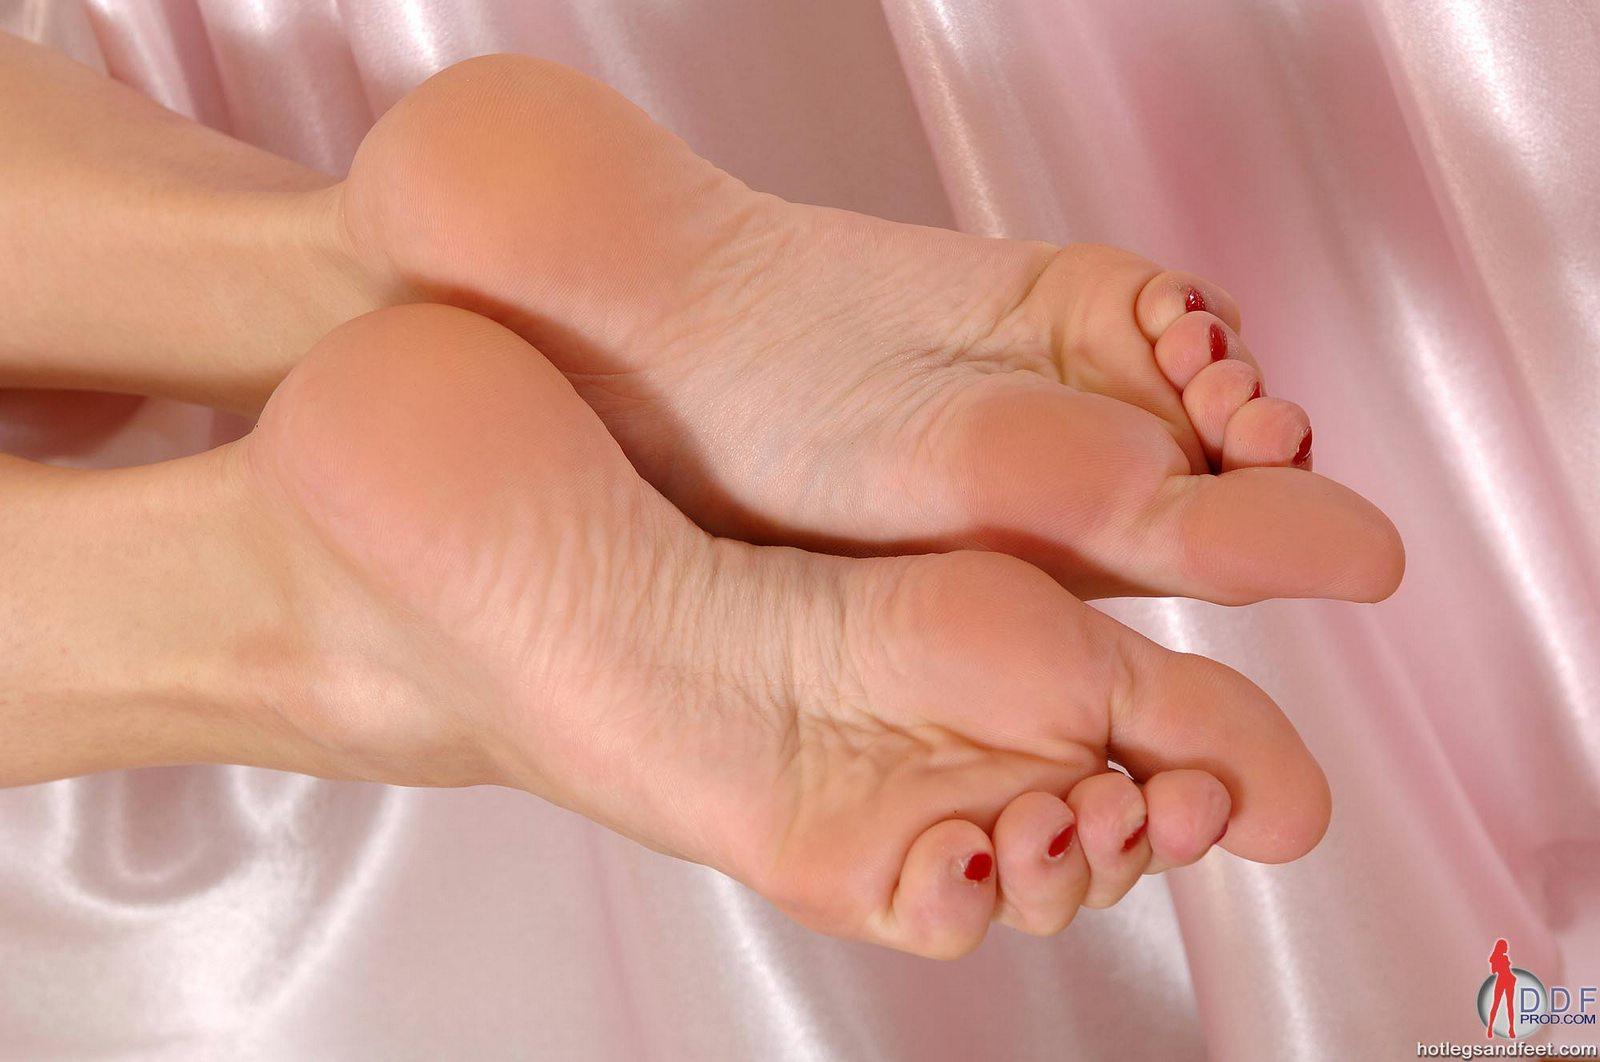 Cute babe Liz Valery showing off her pretty feet - My ...